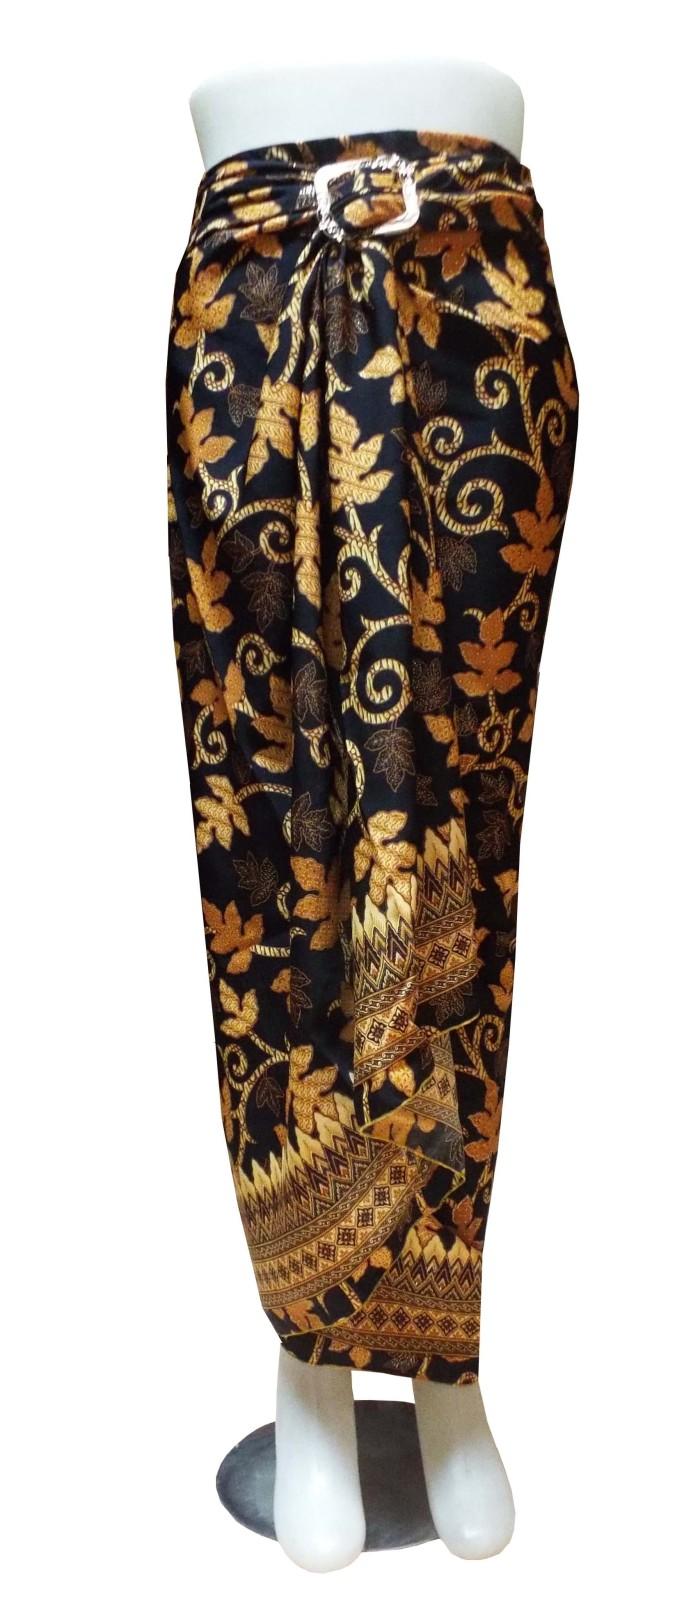 1set Kain Batik Kombinasi Bahan Katun Dan Embos Murah Kkk035 Source · Kain Batik Bahan Katun